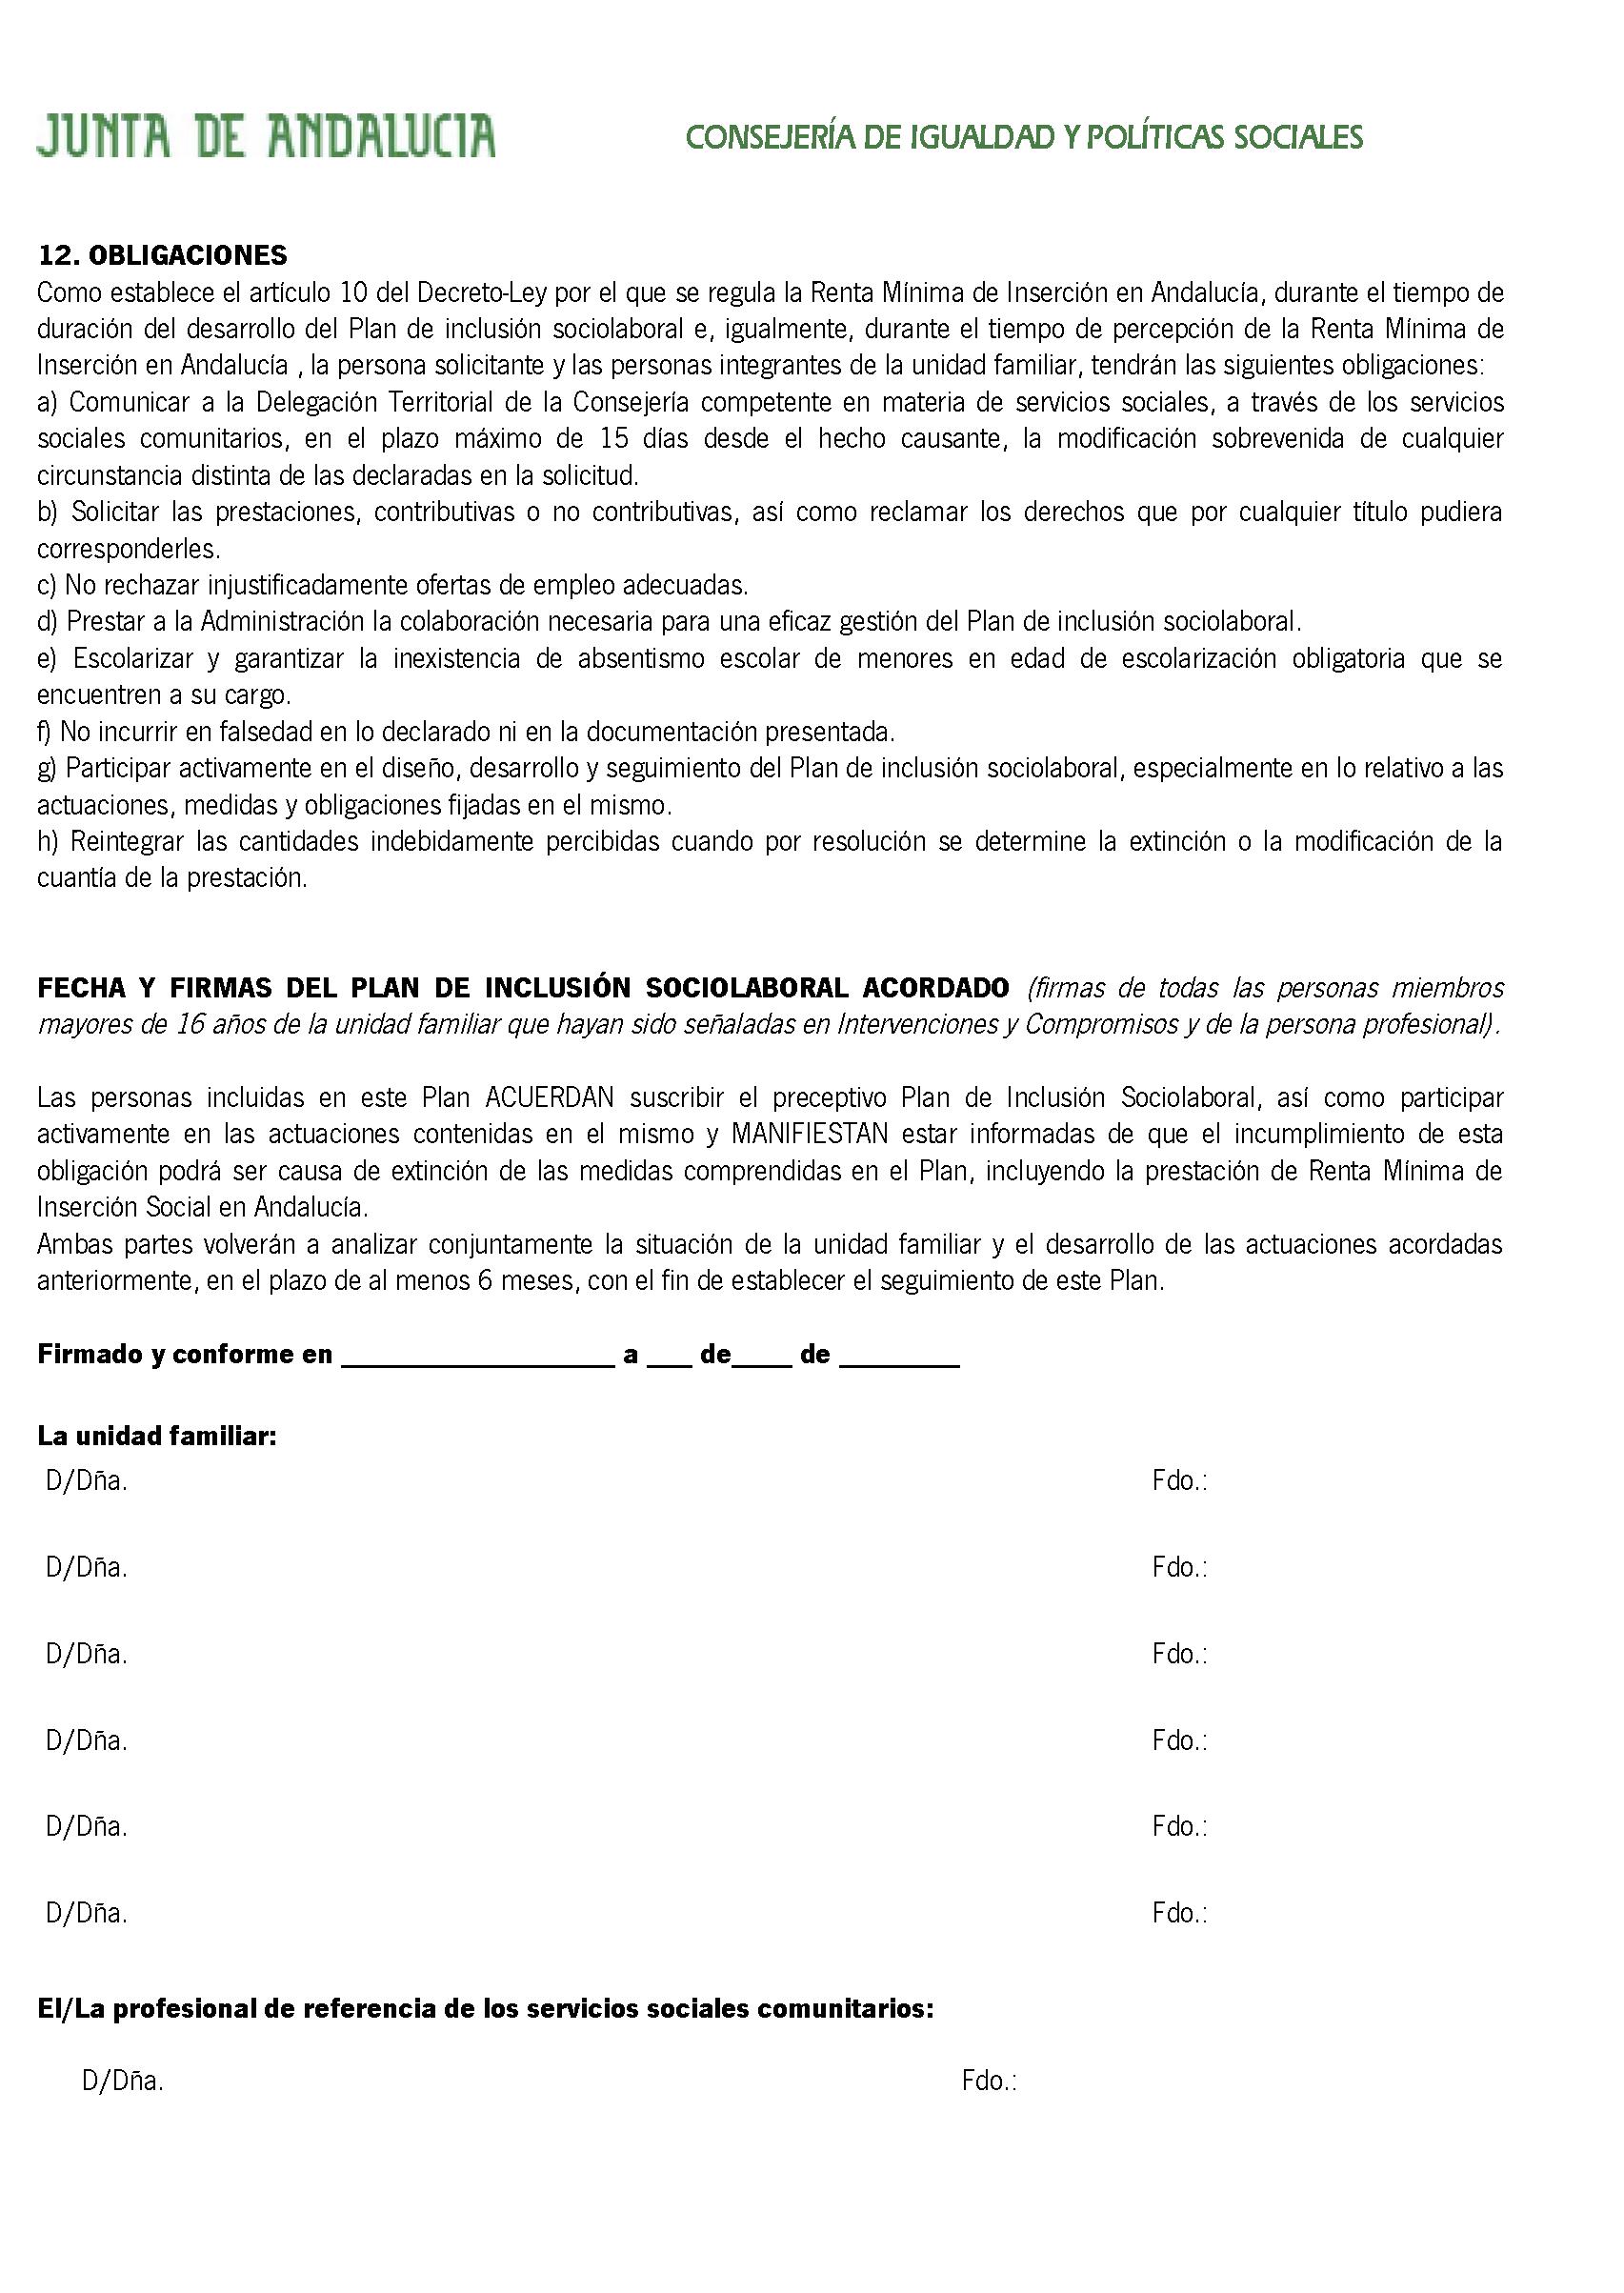 BOE.es - Documento consolidado BOJA-b-2017-90529